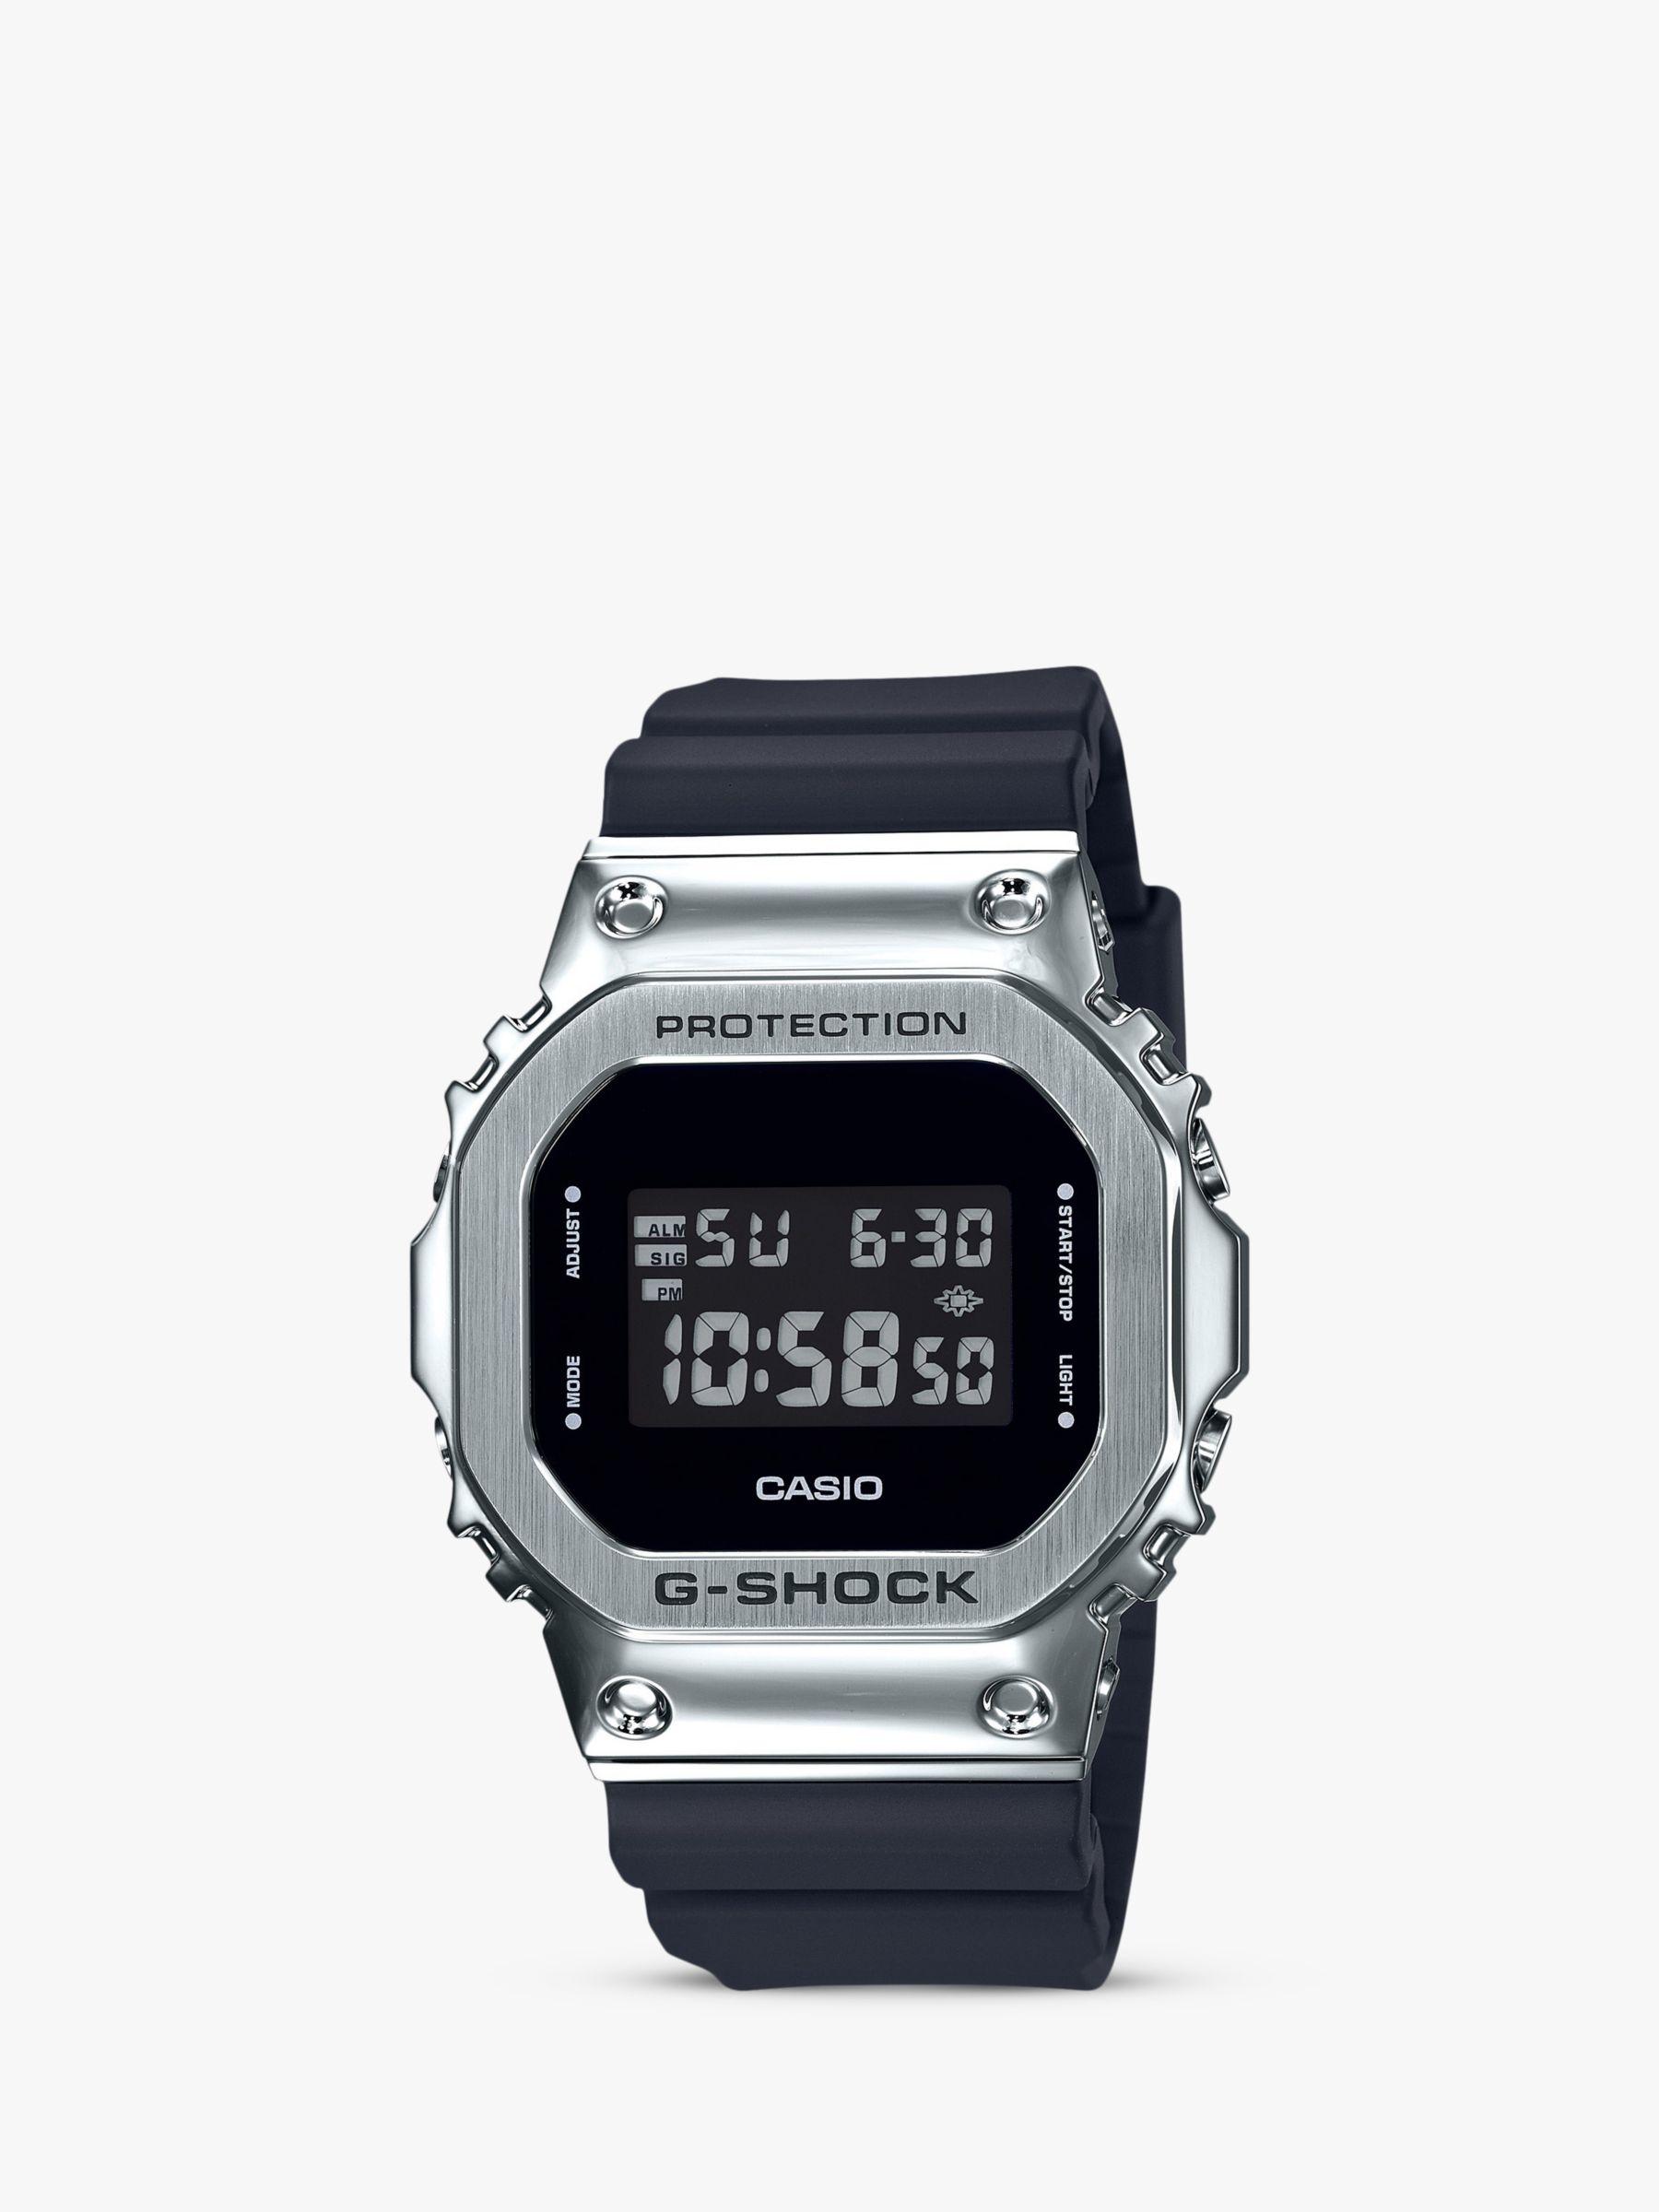 Casio Casio GM-5600-1ER Men's G-Shock Digital Resin Strap Watch, Black